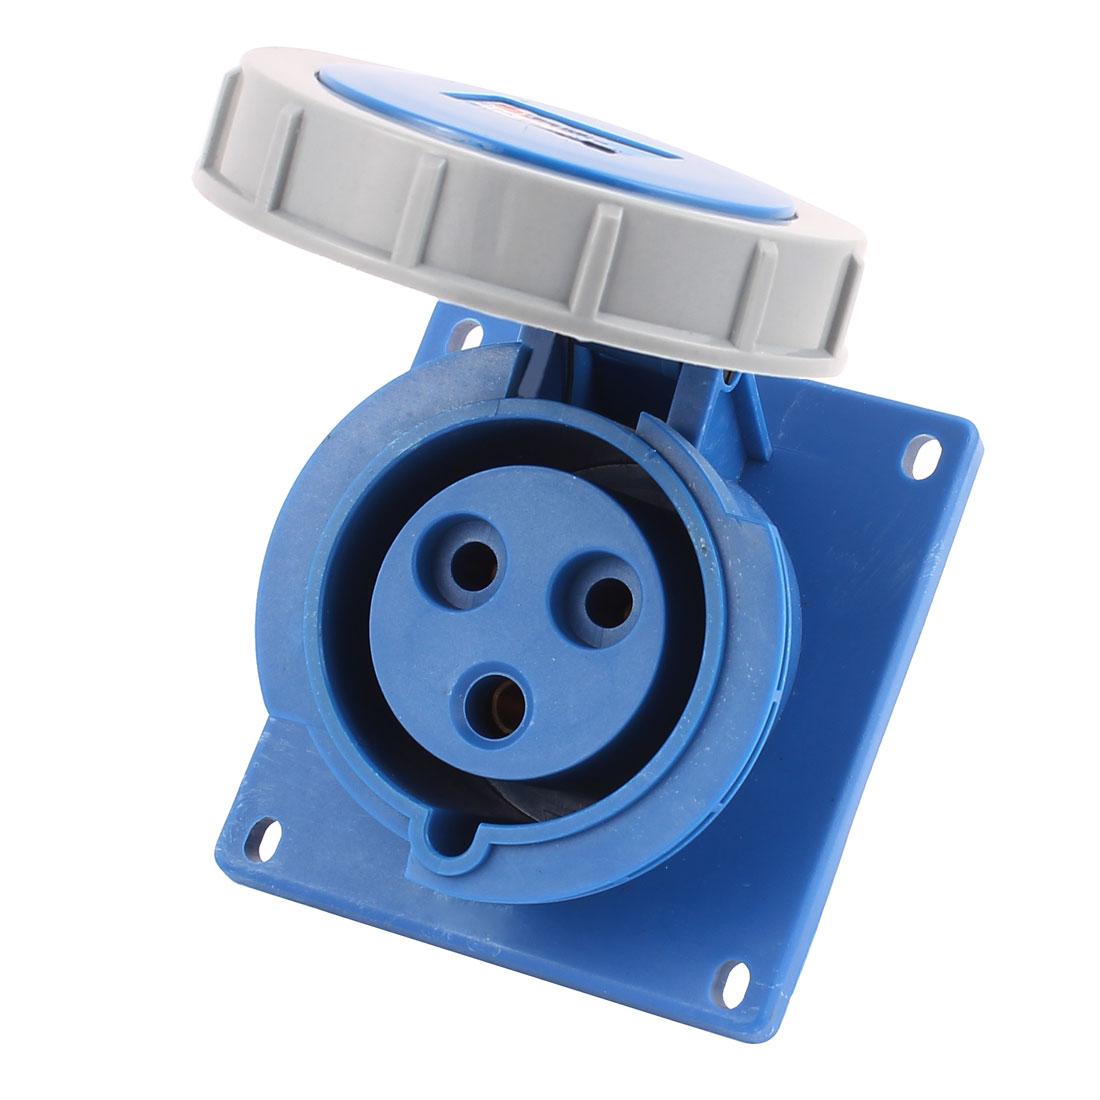 AC 220V-250V 32A IP67 2P+E 3P Female Industrial Consealing Oblique Socket